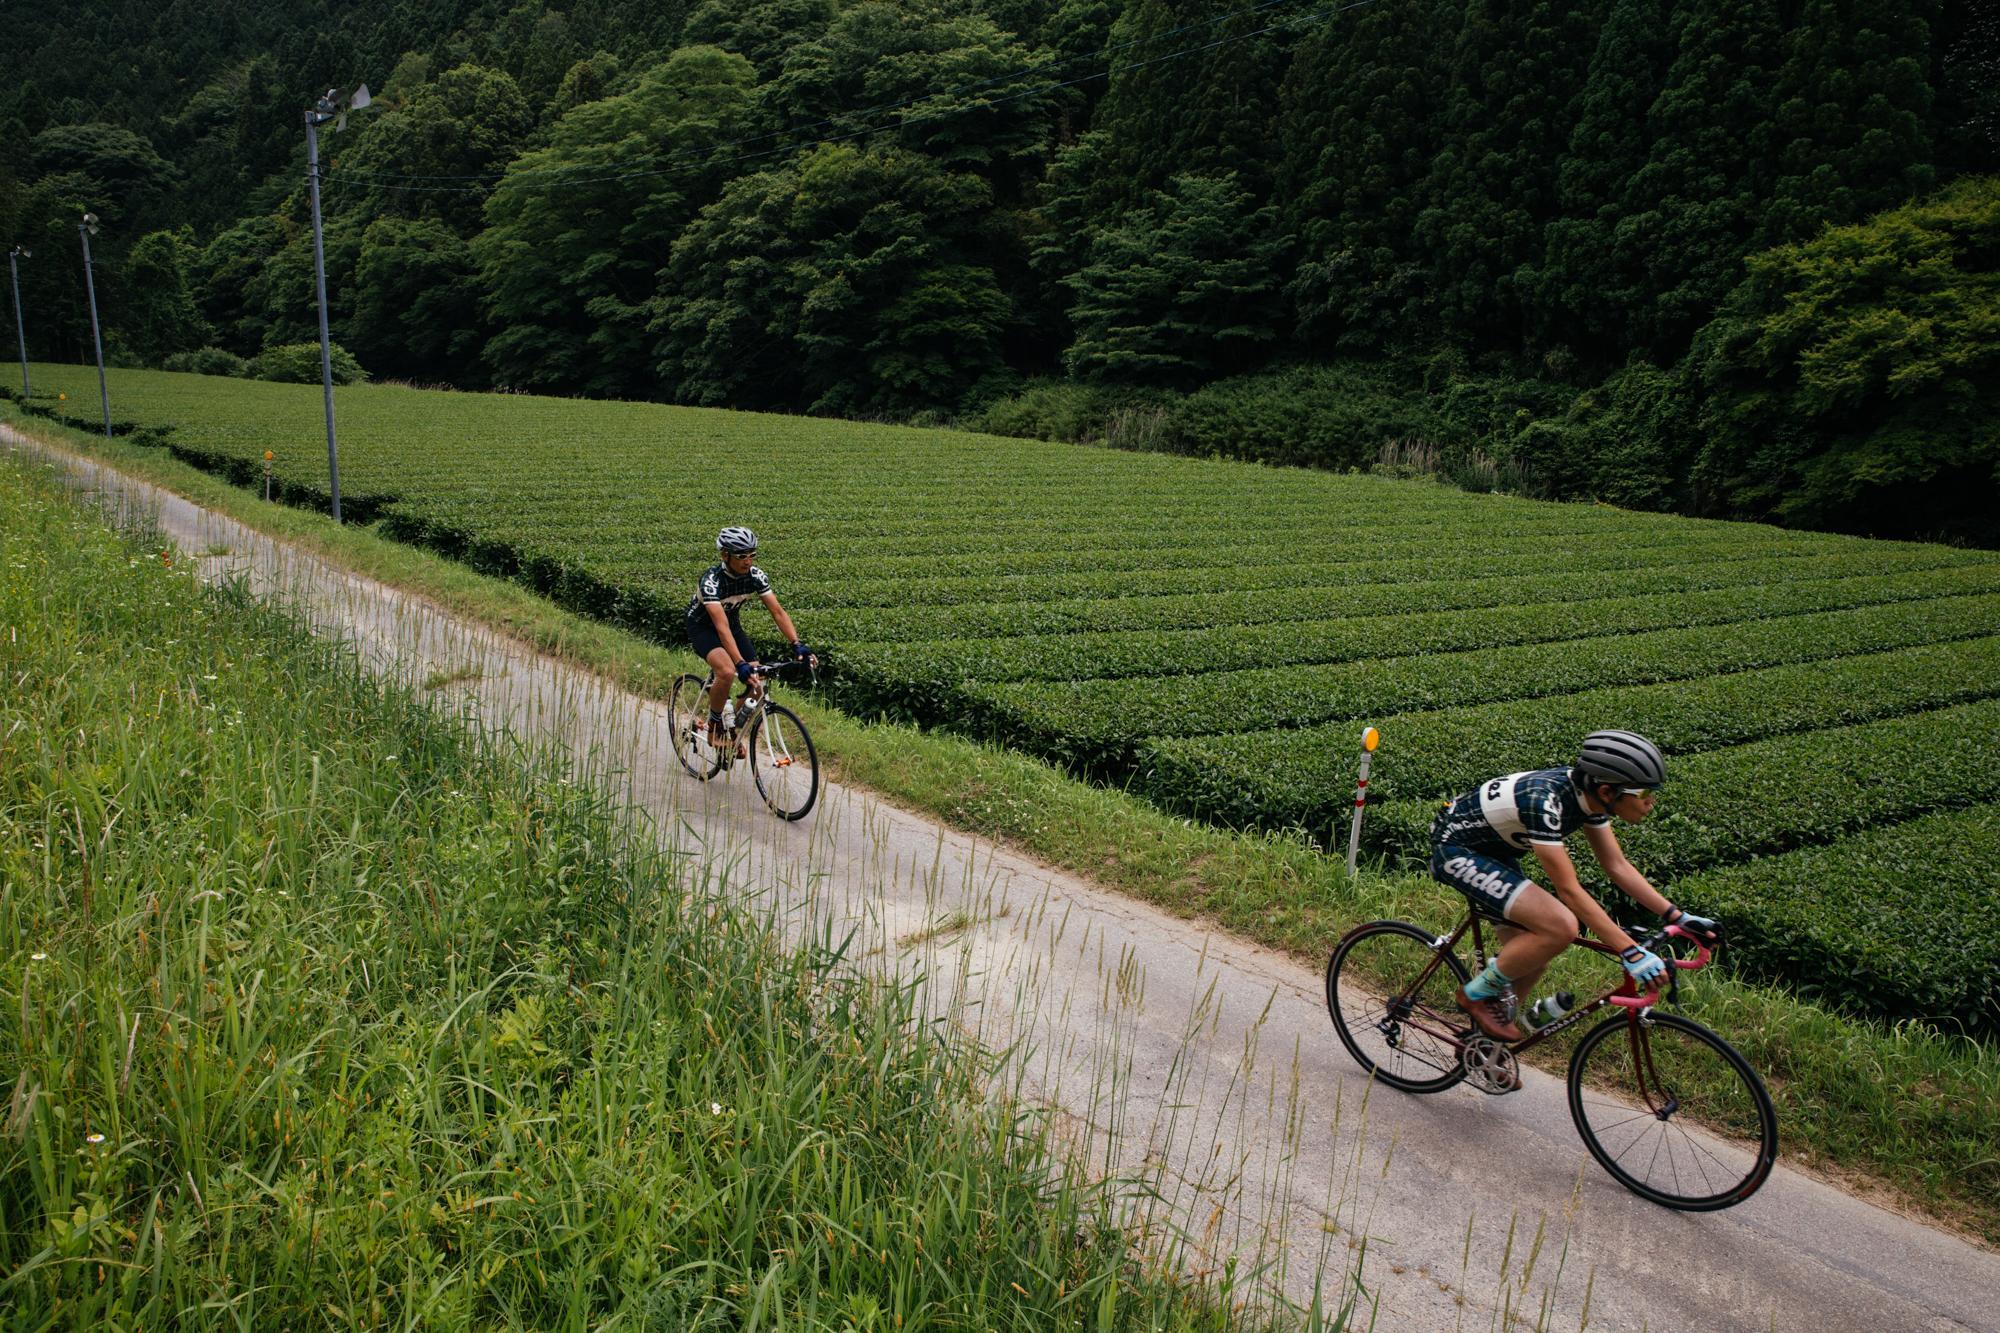 Riding through the tea fields